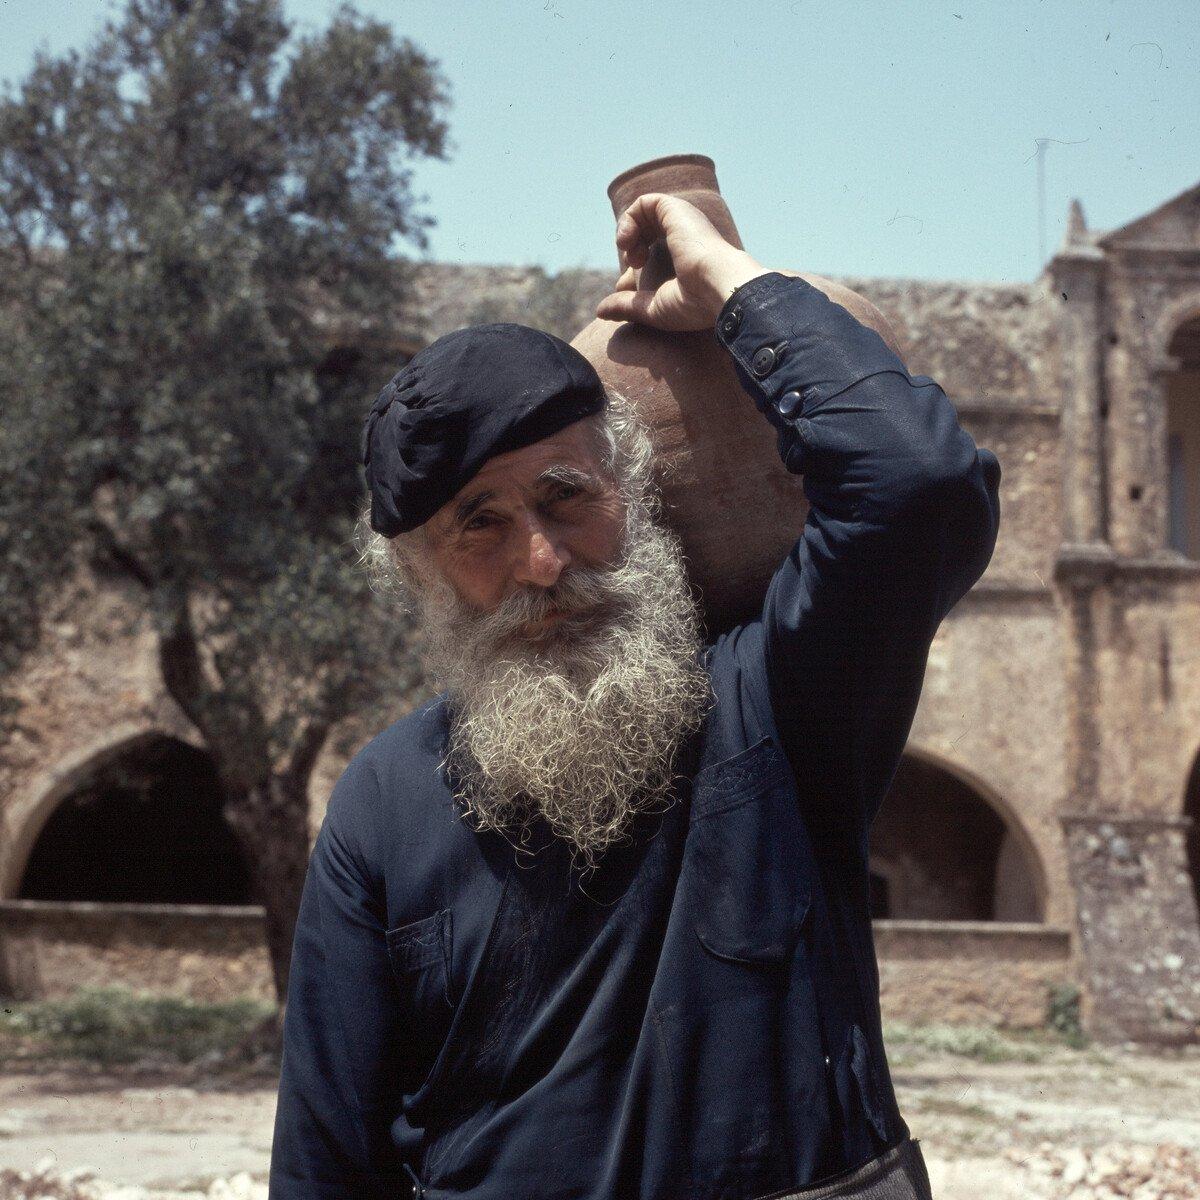 Rethimno. Klášter Arkadi. Mnich v klášteře Arkadi poblíž Rethymna, 1963. © Foto: Konrad Helbig / Deutsche Fotothek, LIFO